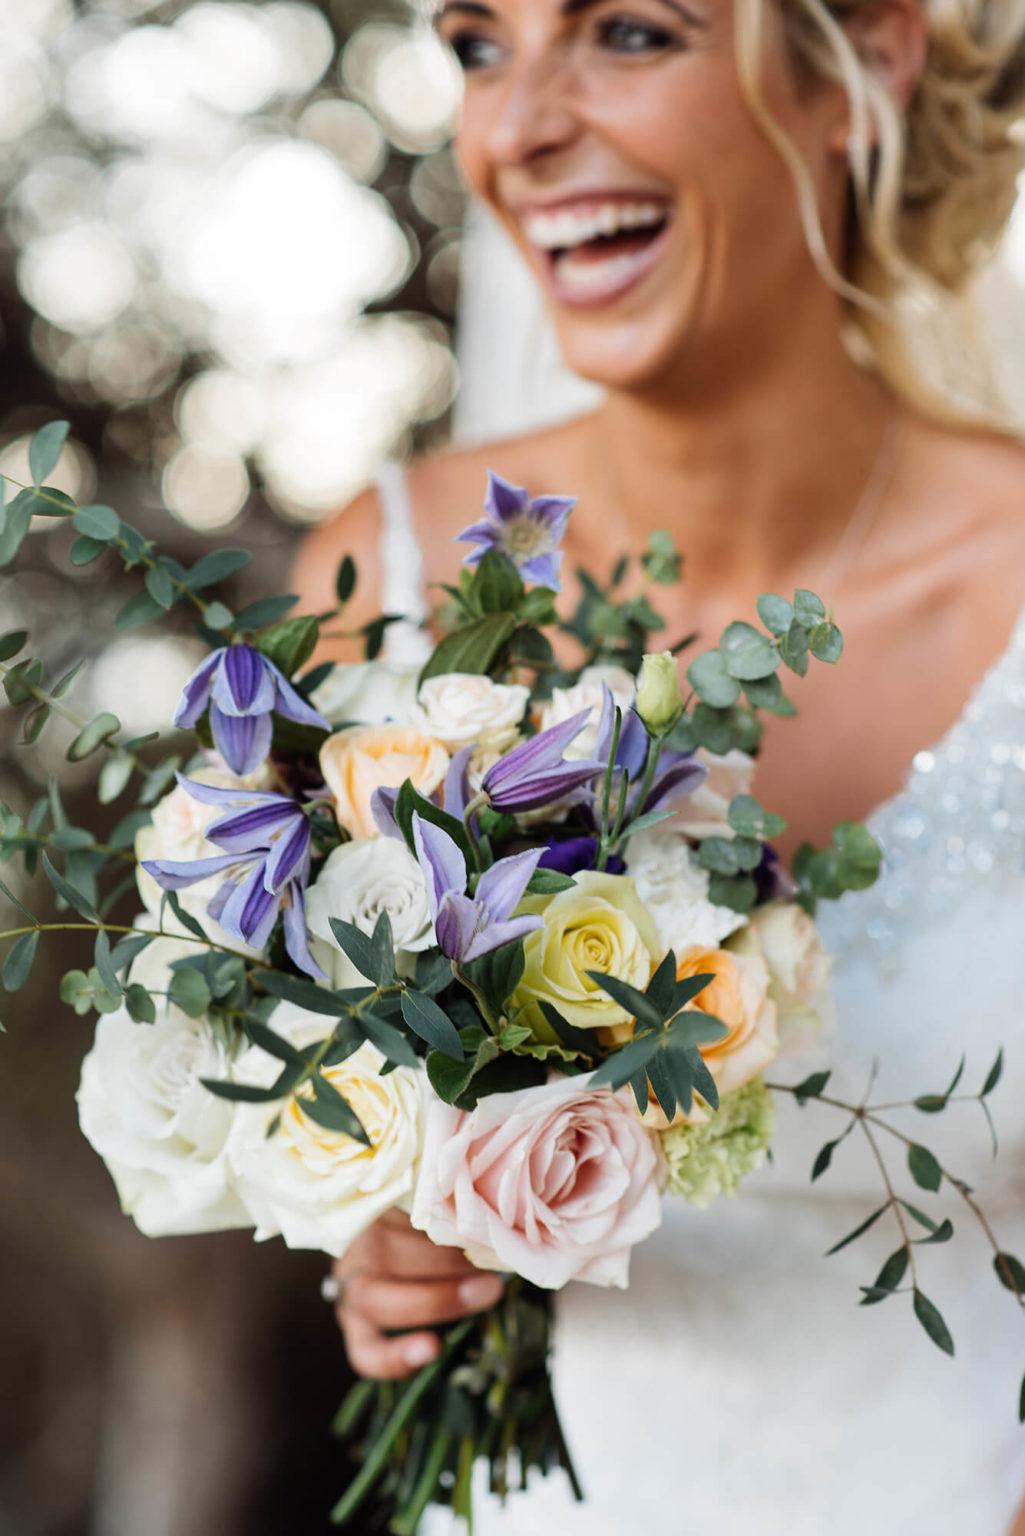 https://www.white-ibiza.com/wp-content/uploads/2020/03/white-ibiza-weddings-dario-sanz-photography-2020-09-1-1025x1536.jpg